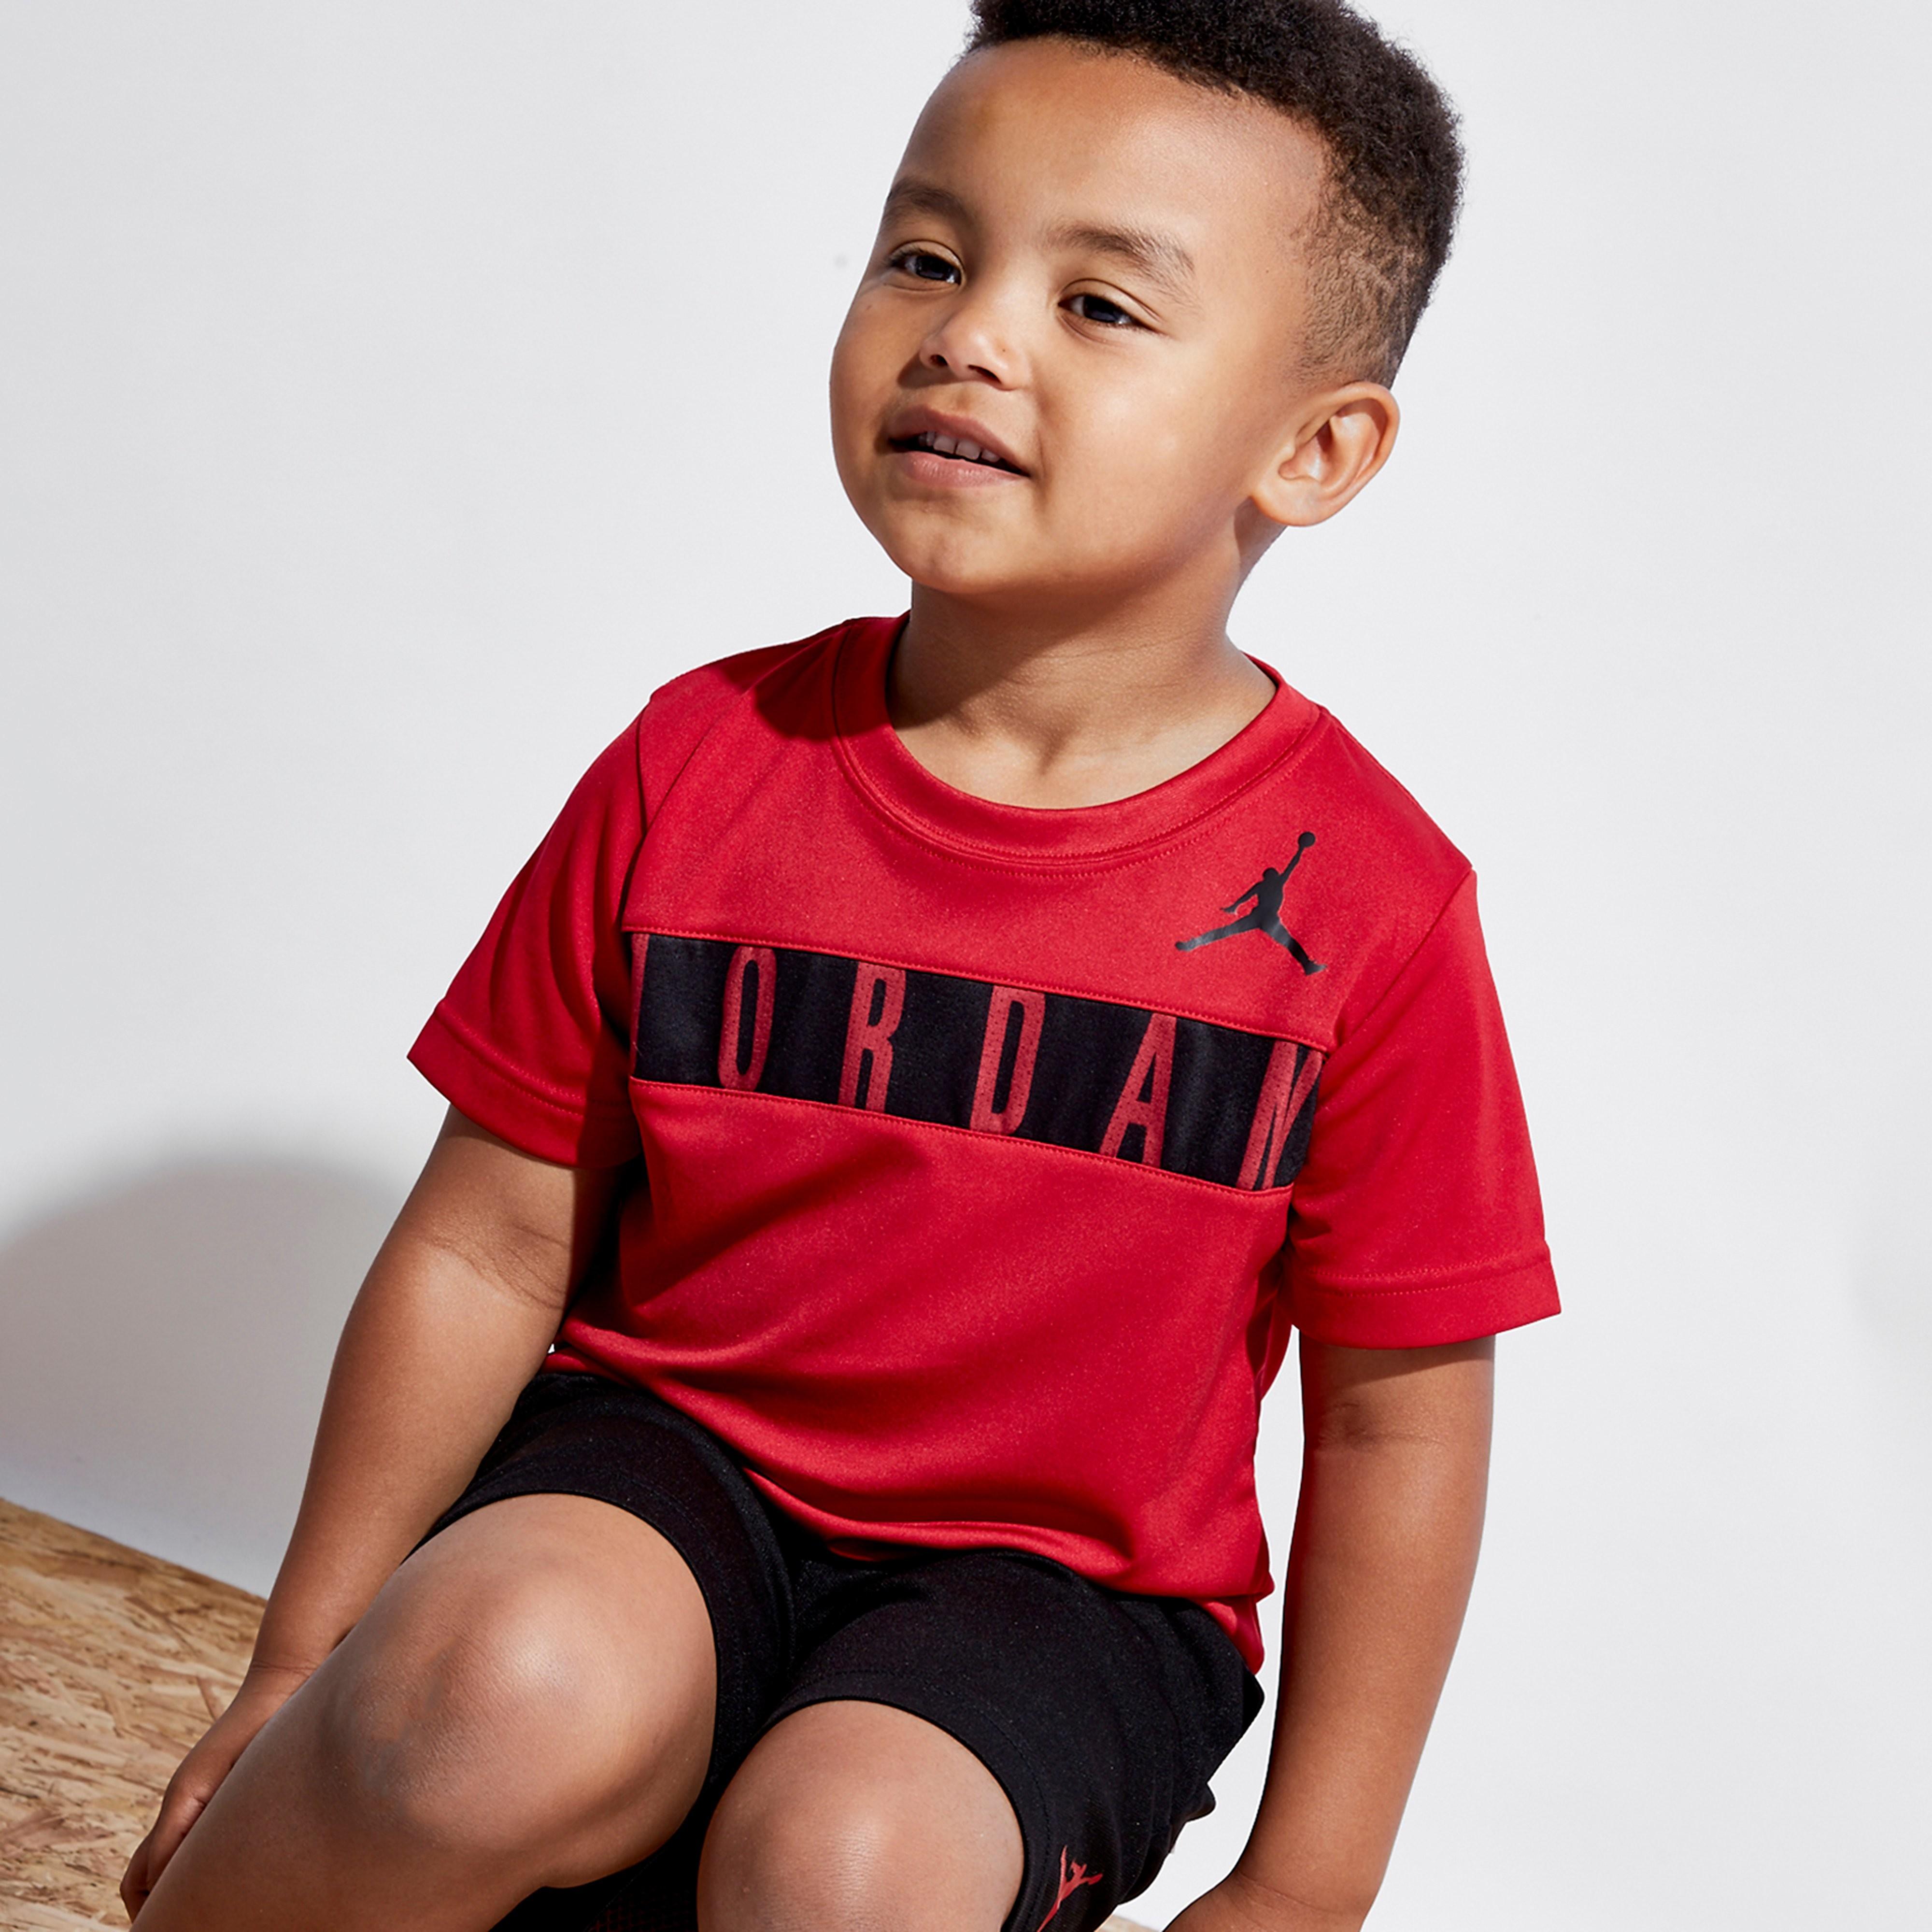 Jordan camiseta 23 Alpha infantil